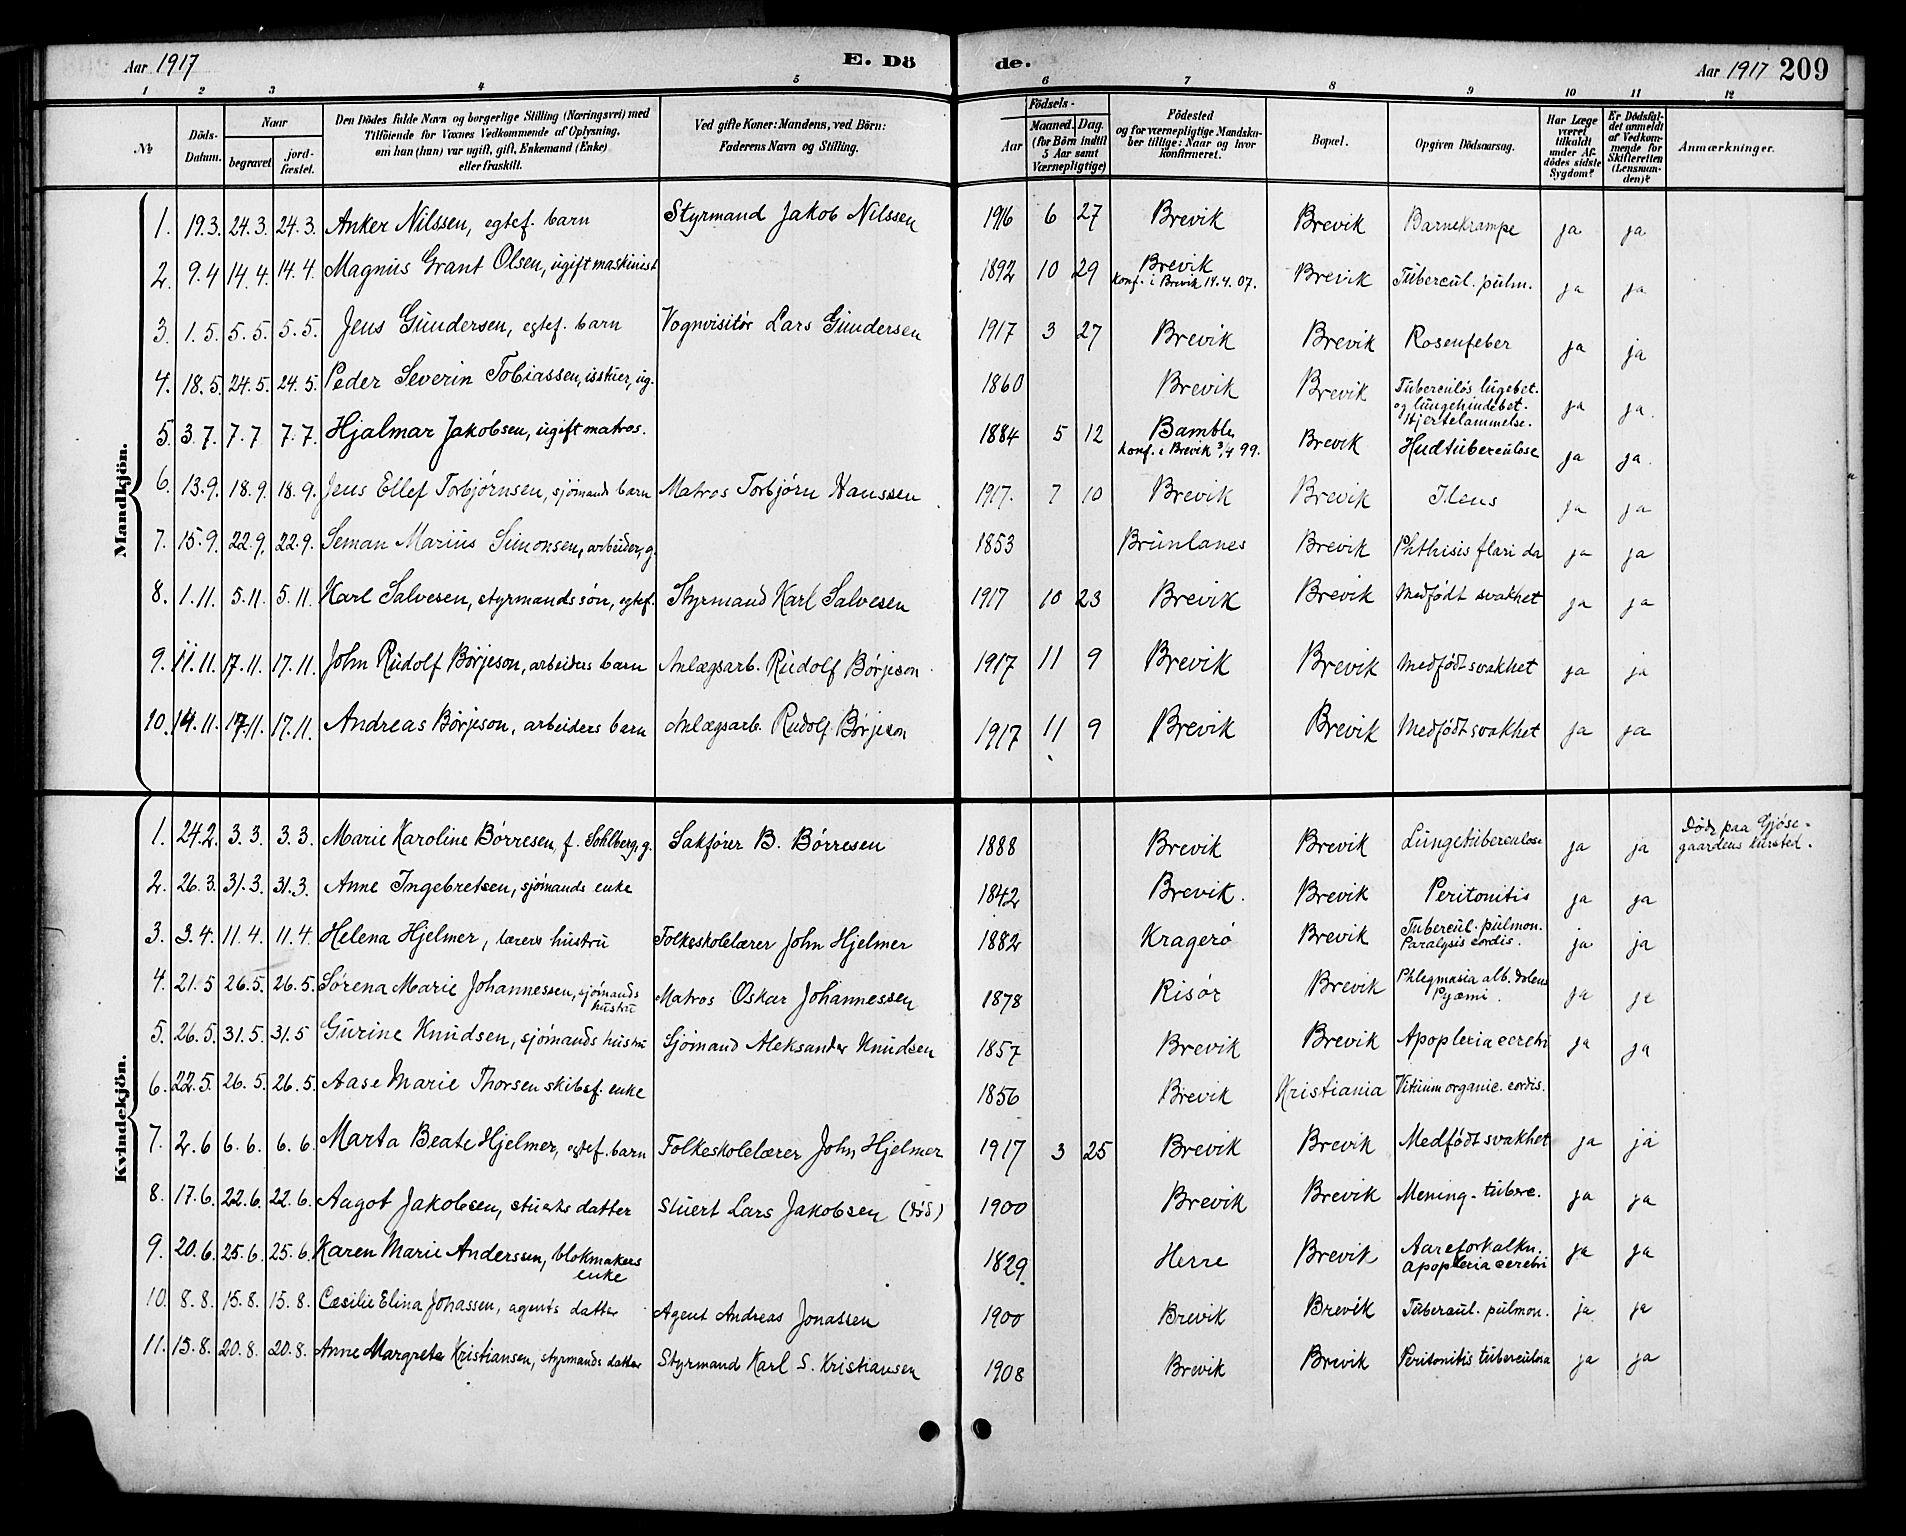 SAKO, Brevik kirkebøker, G/Ga/L0005: Klokkerbok nr. 5, 1901-1924, s. 209